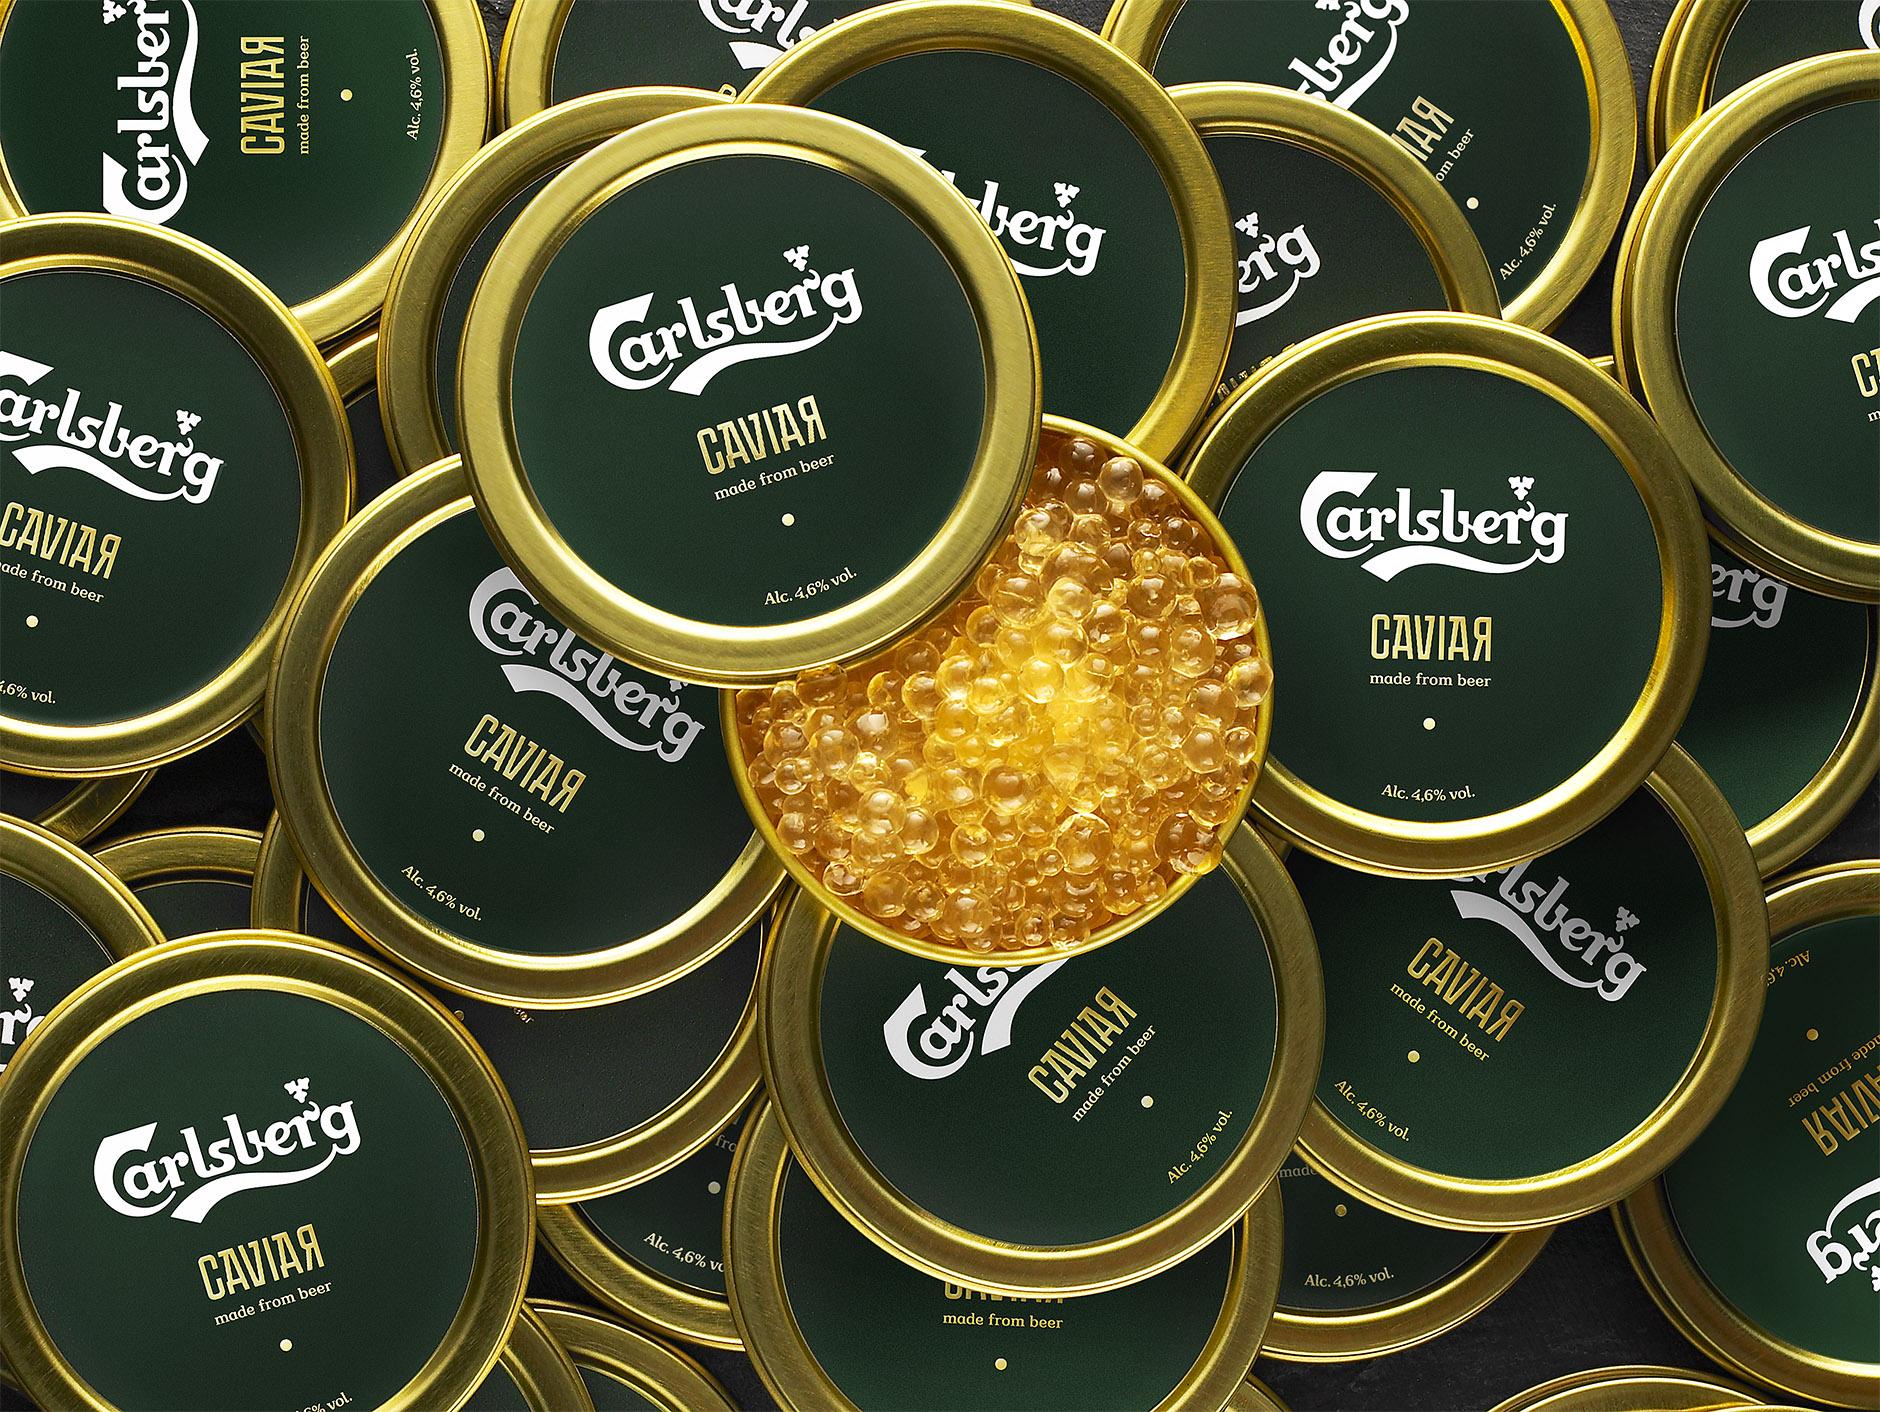 Carlsberg_Caviar_LowRes_Pile.jpg